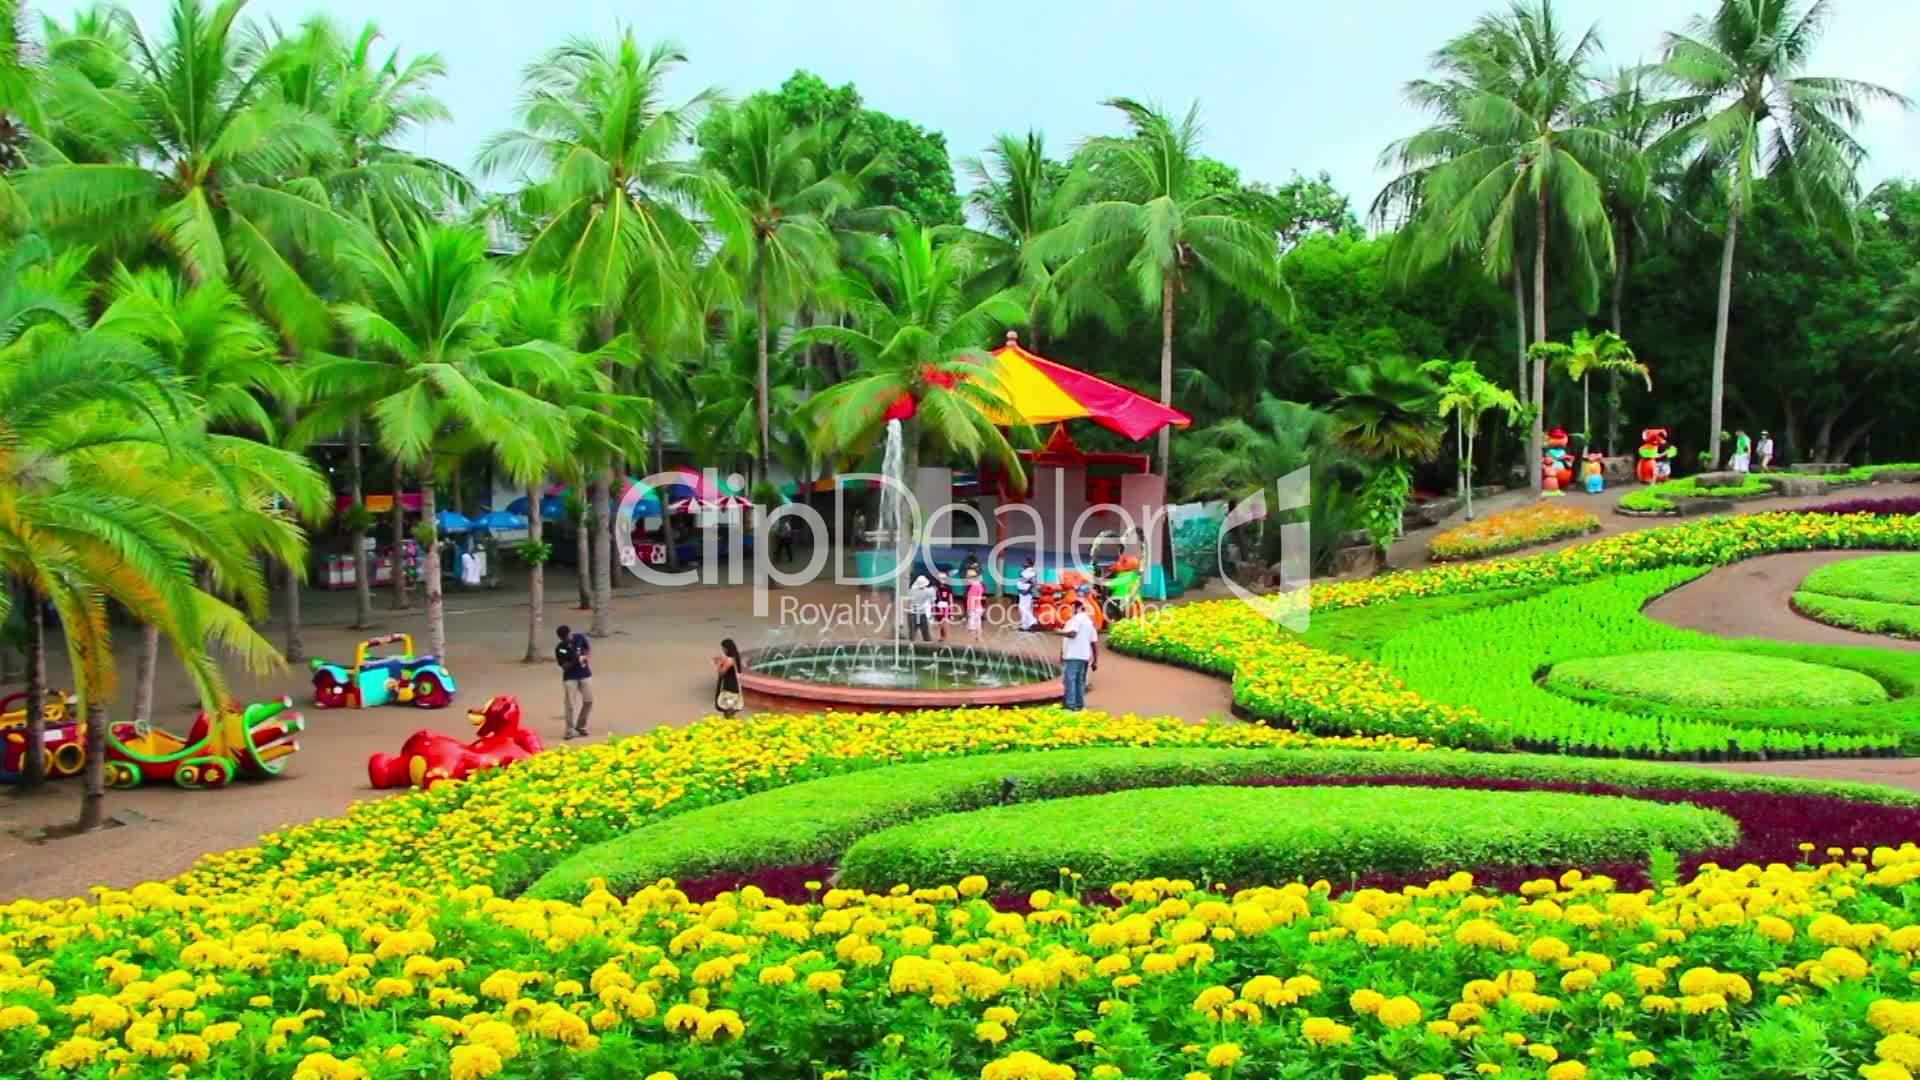 peoples walks in nong nooch tropical garden in thailand royalty